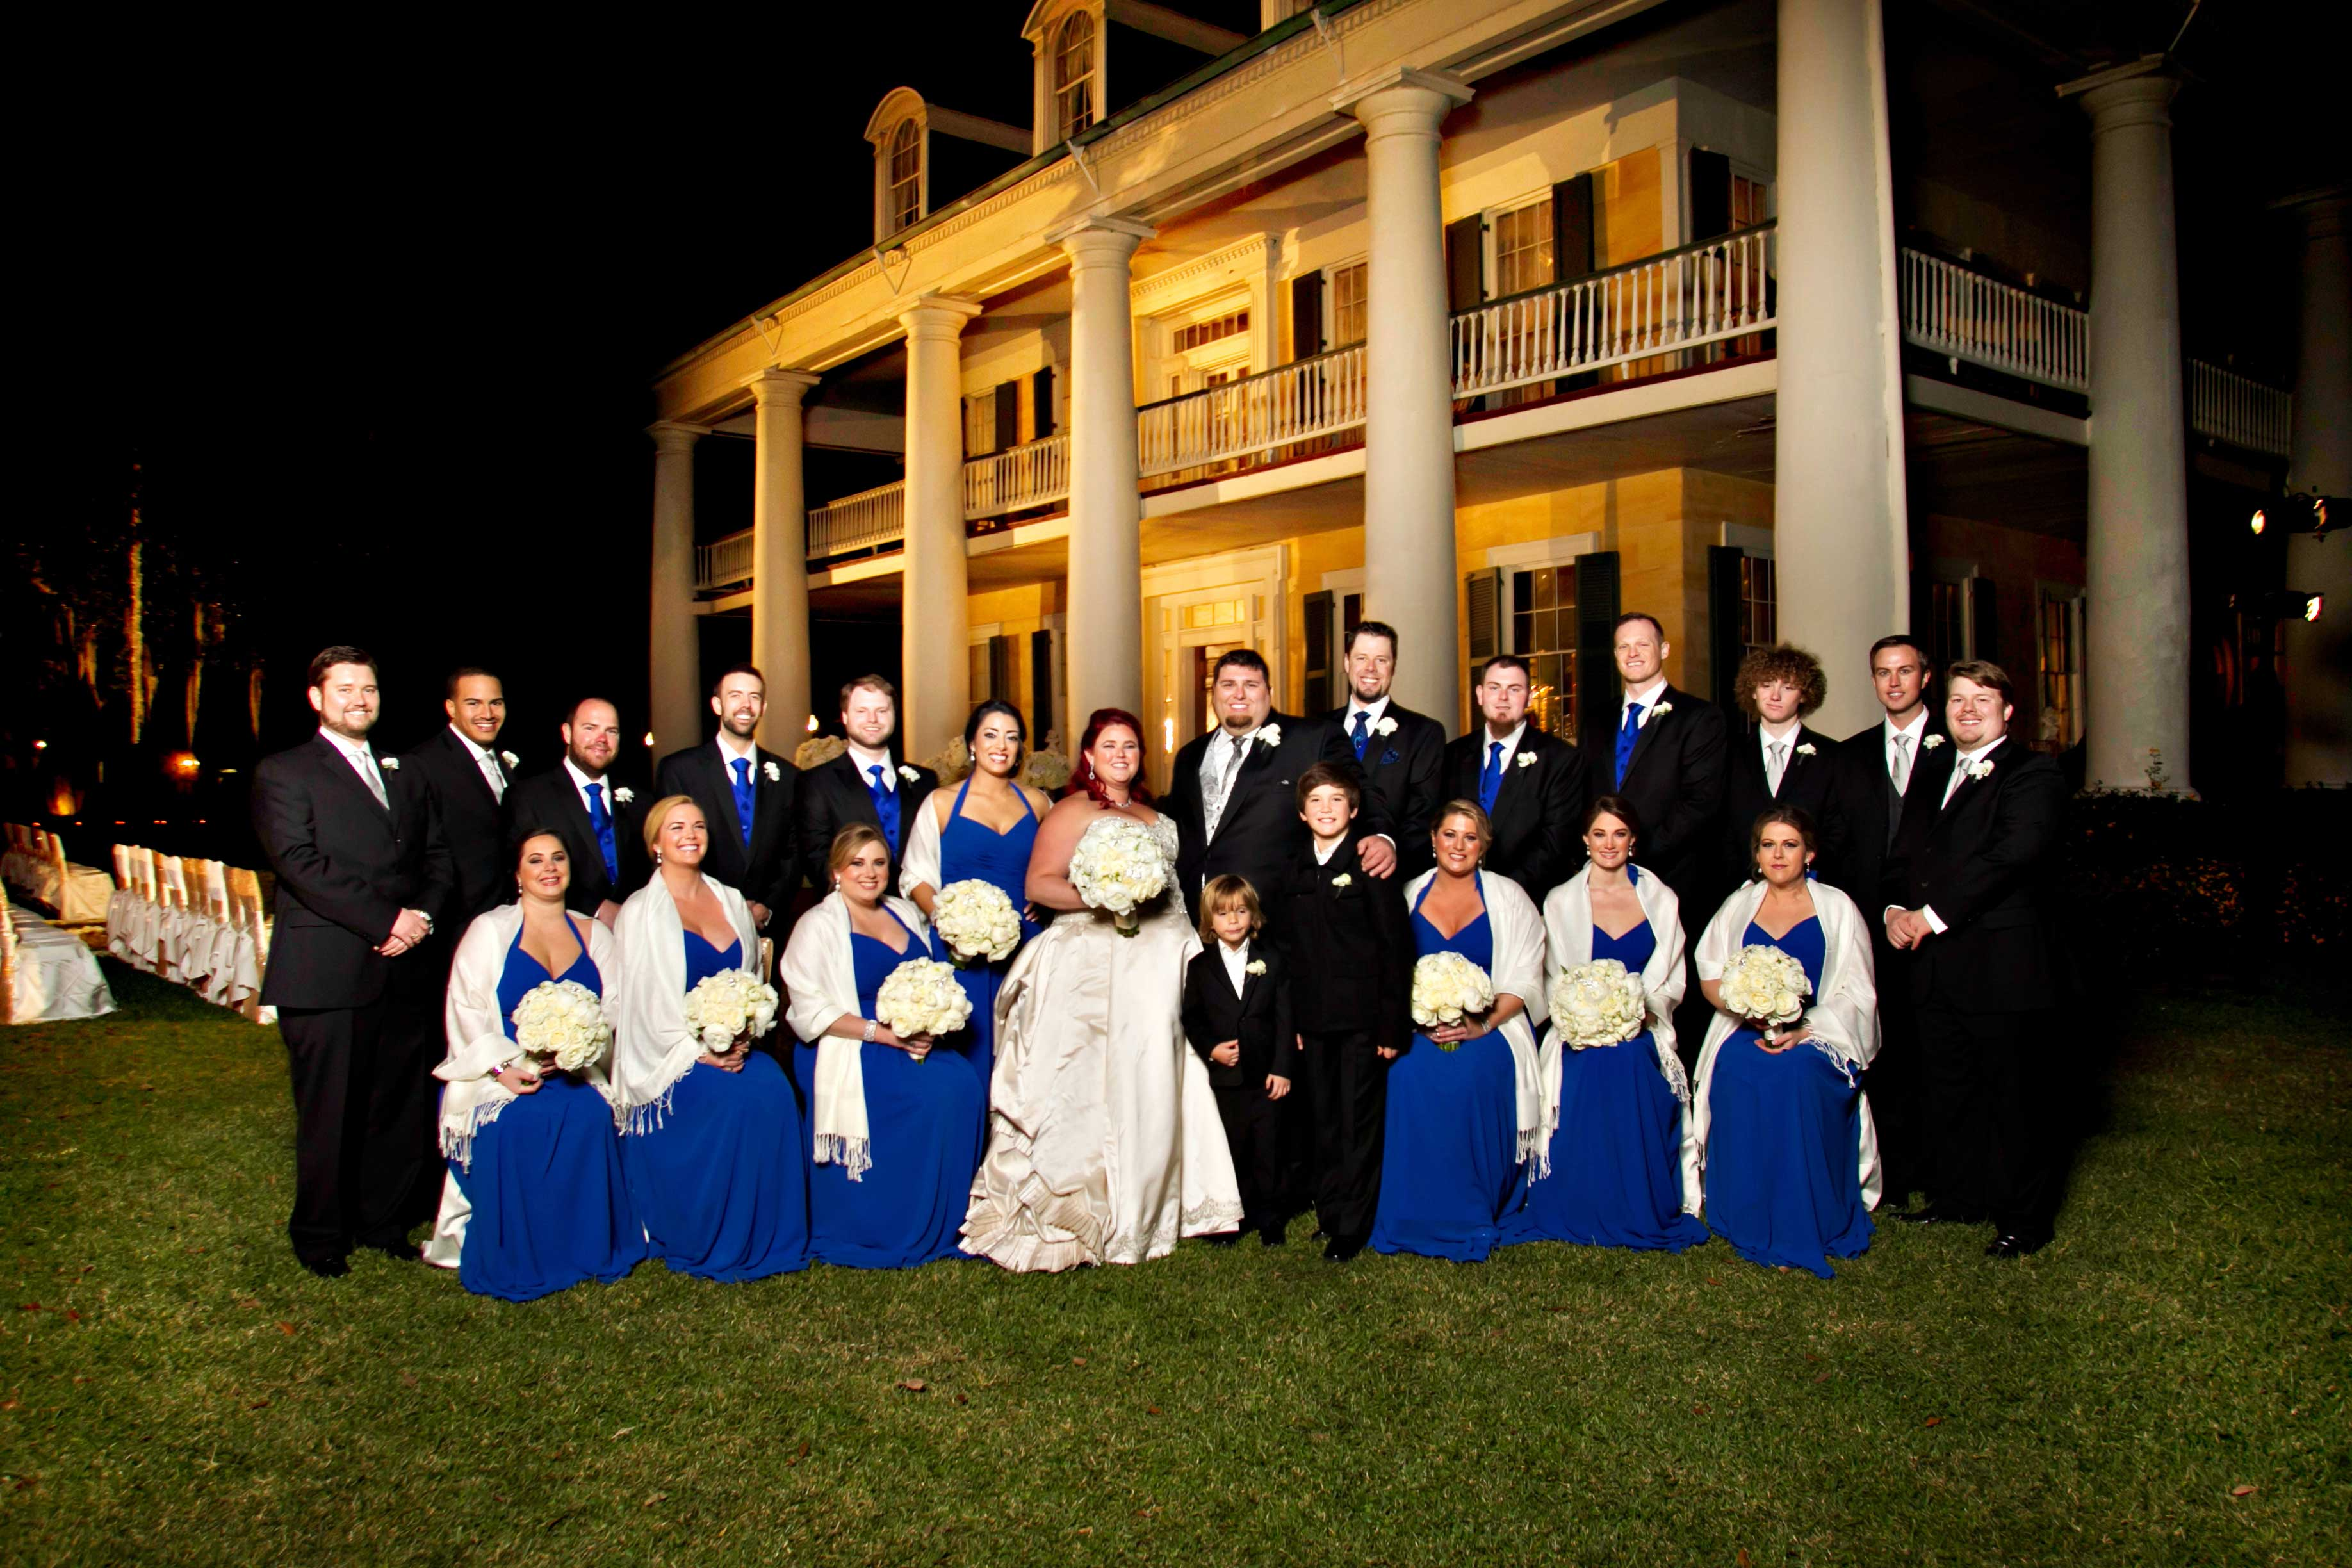 bridesmaid dresses with shawls